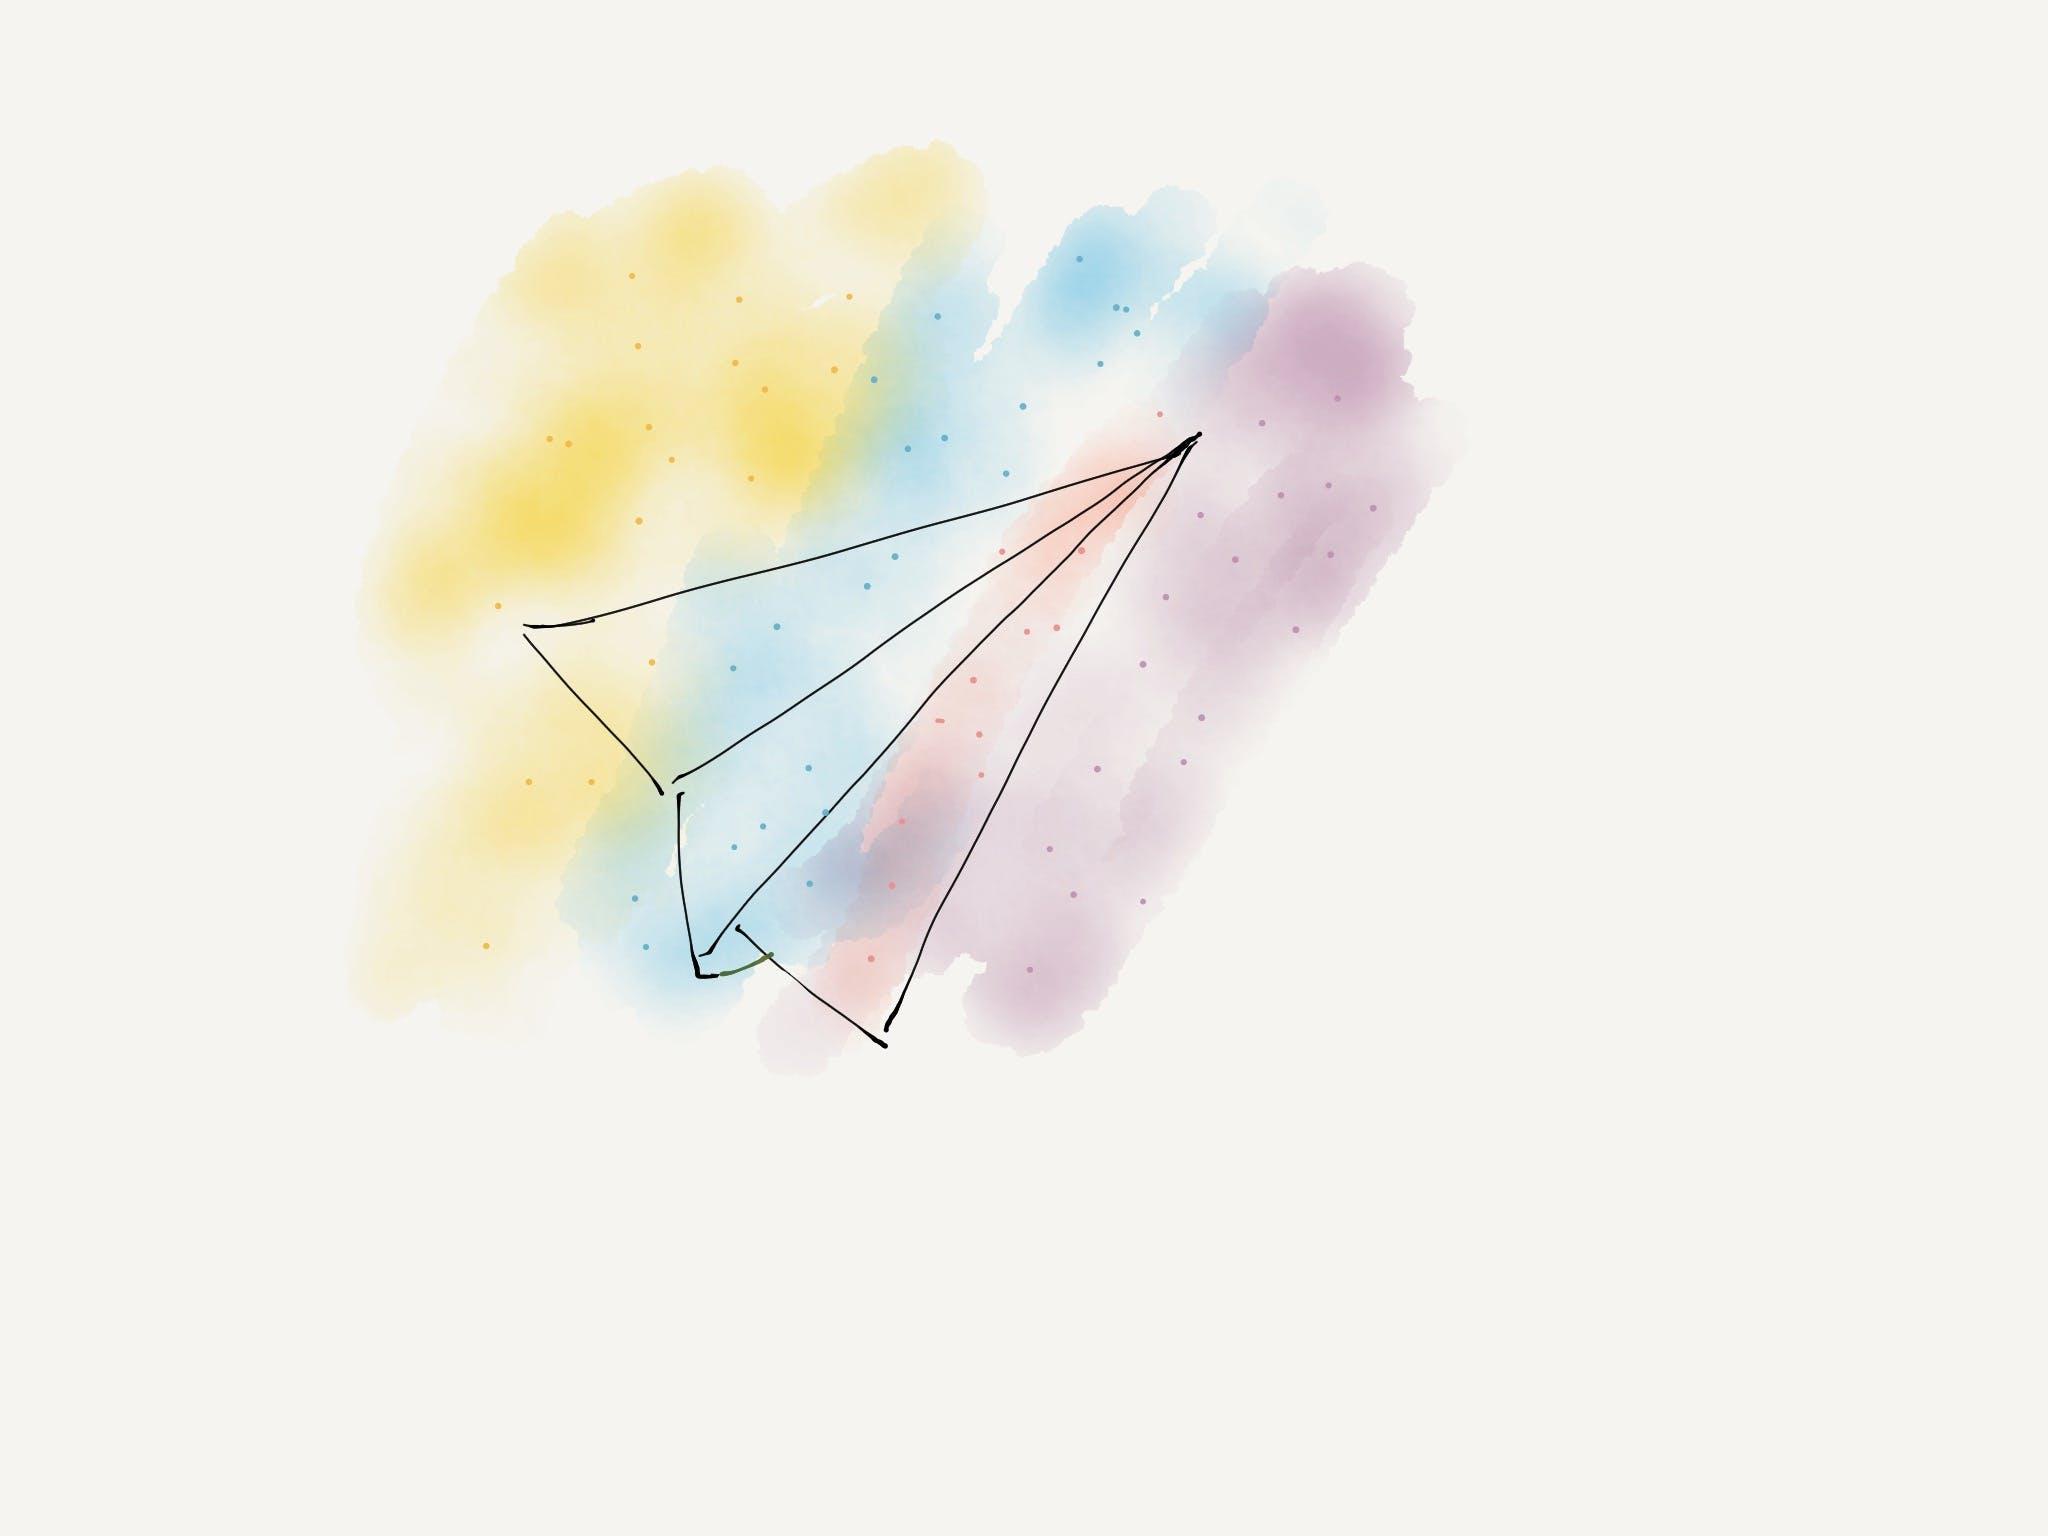 Free stock photo of art, digital art, sketch, sketching